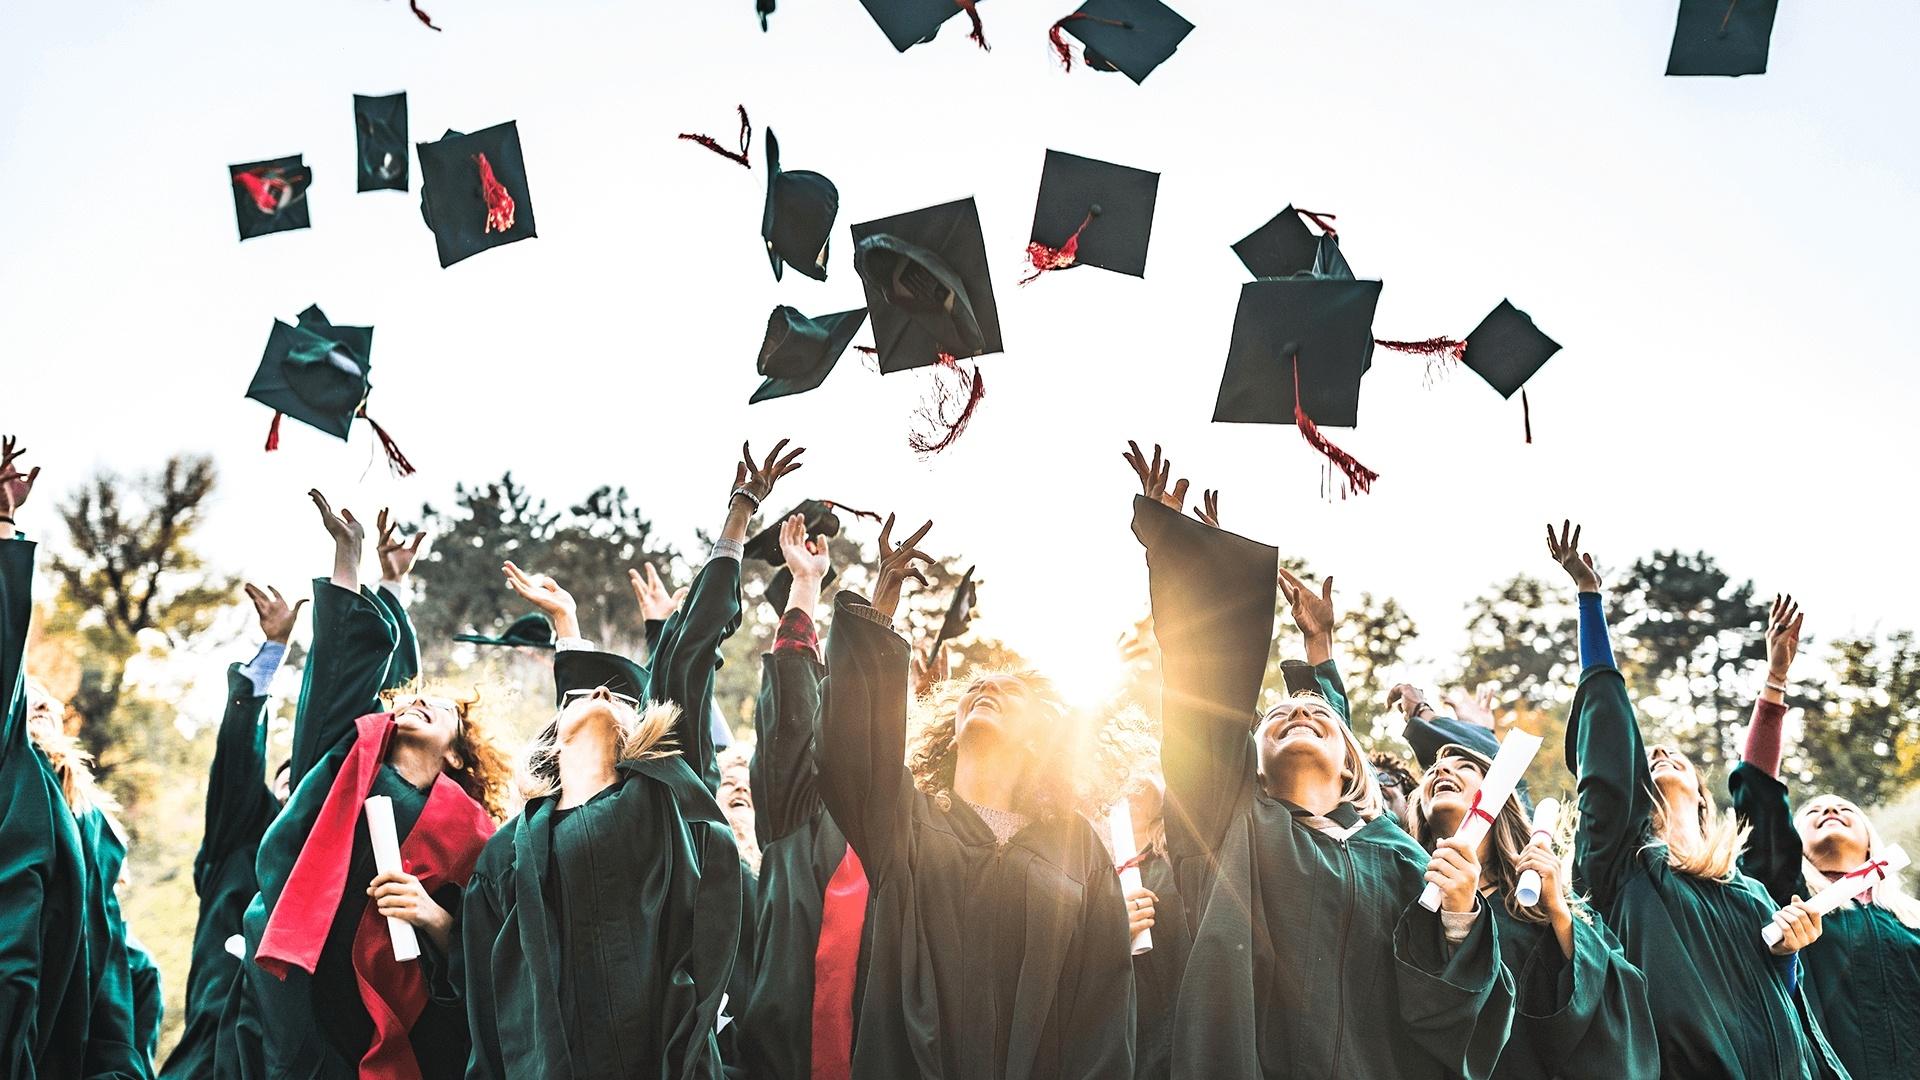 Graduation Wallpaper image hd